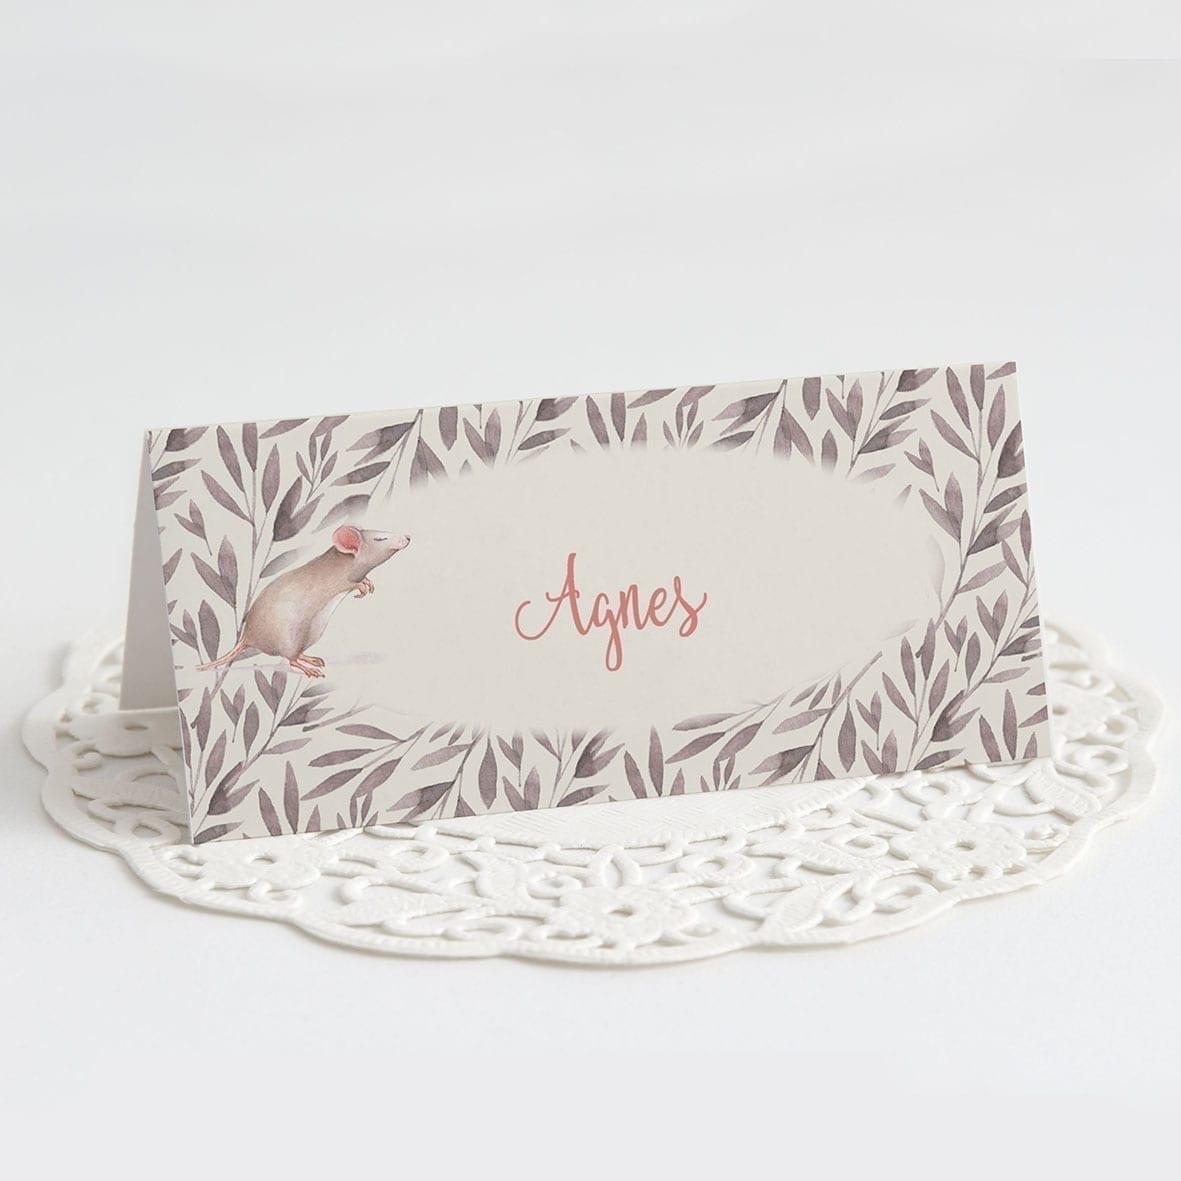 sødt bordkort mus blade